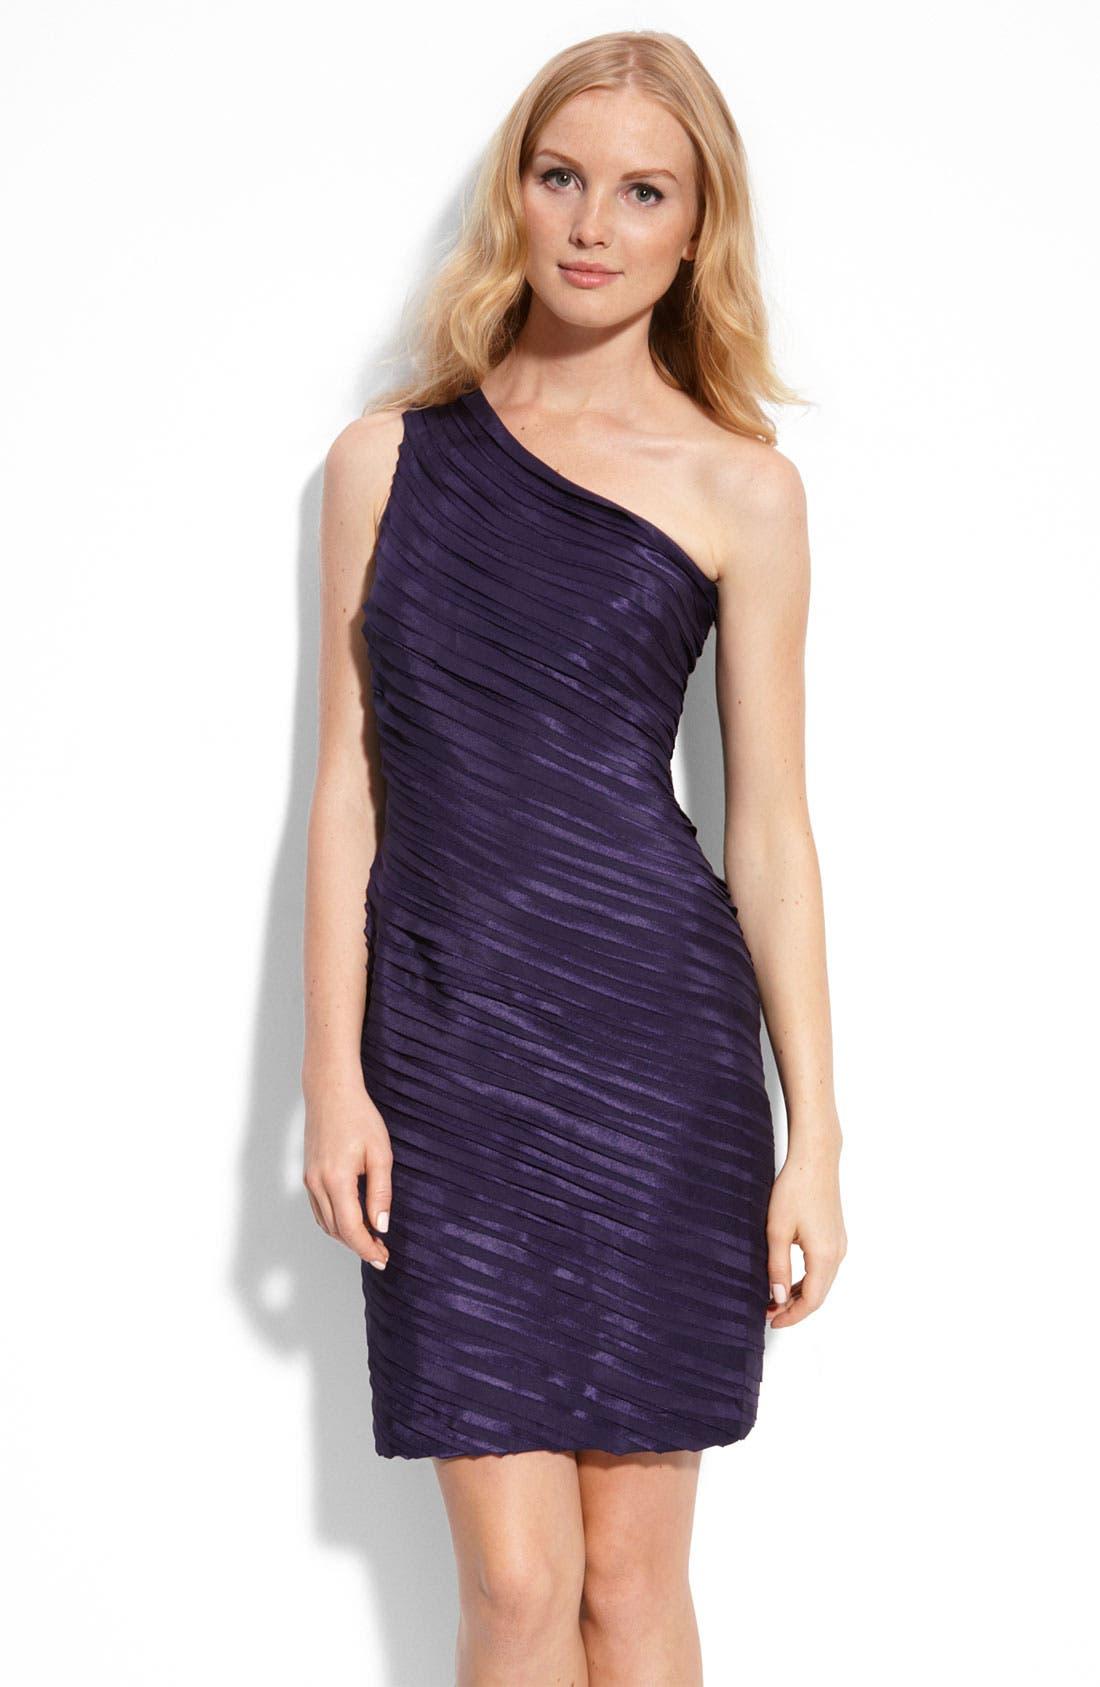 Alternate Image 1 Selected - Calvin Klein One Shoulder Tiered Satin Dress